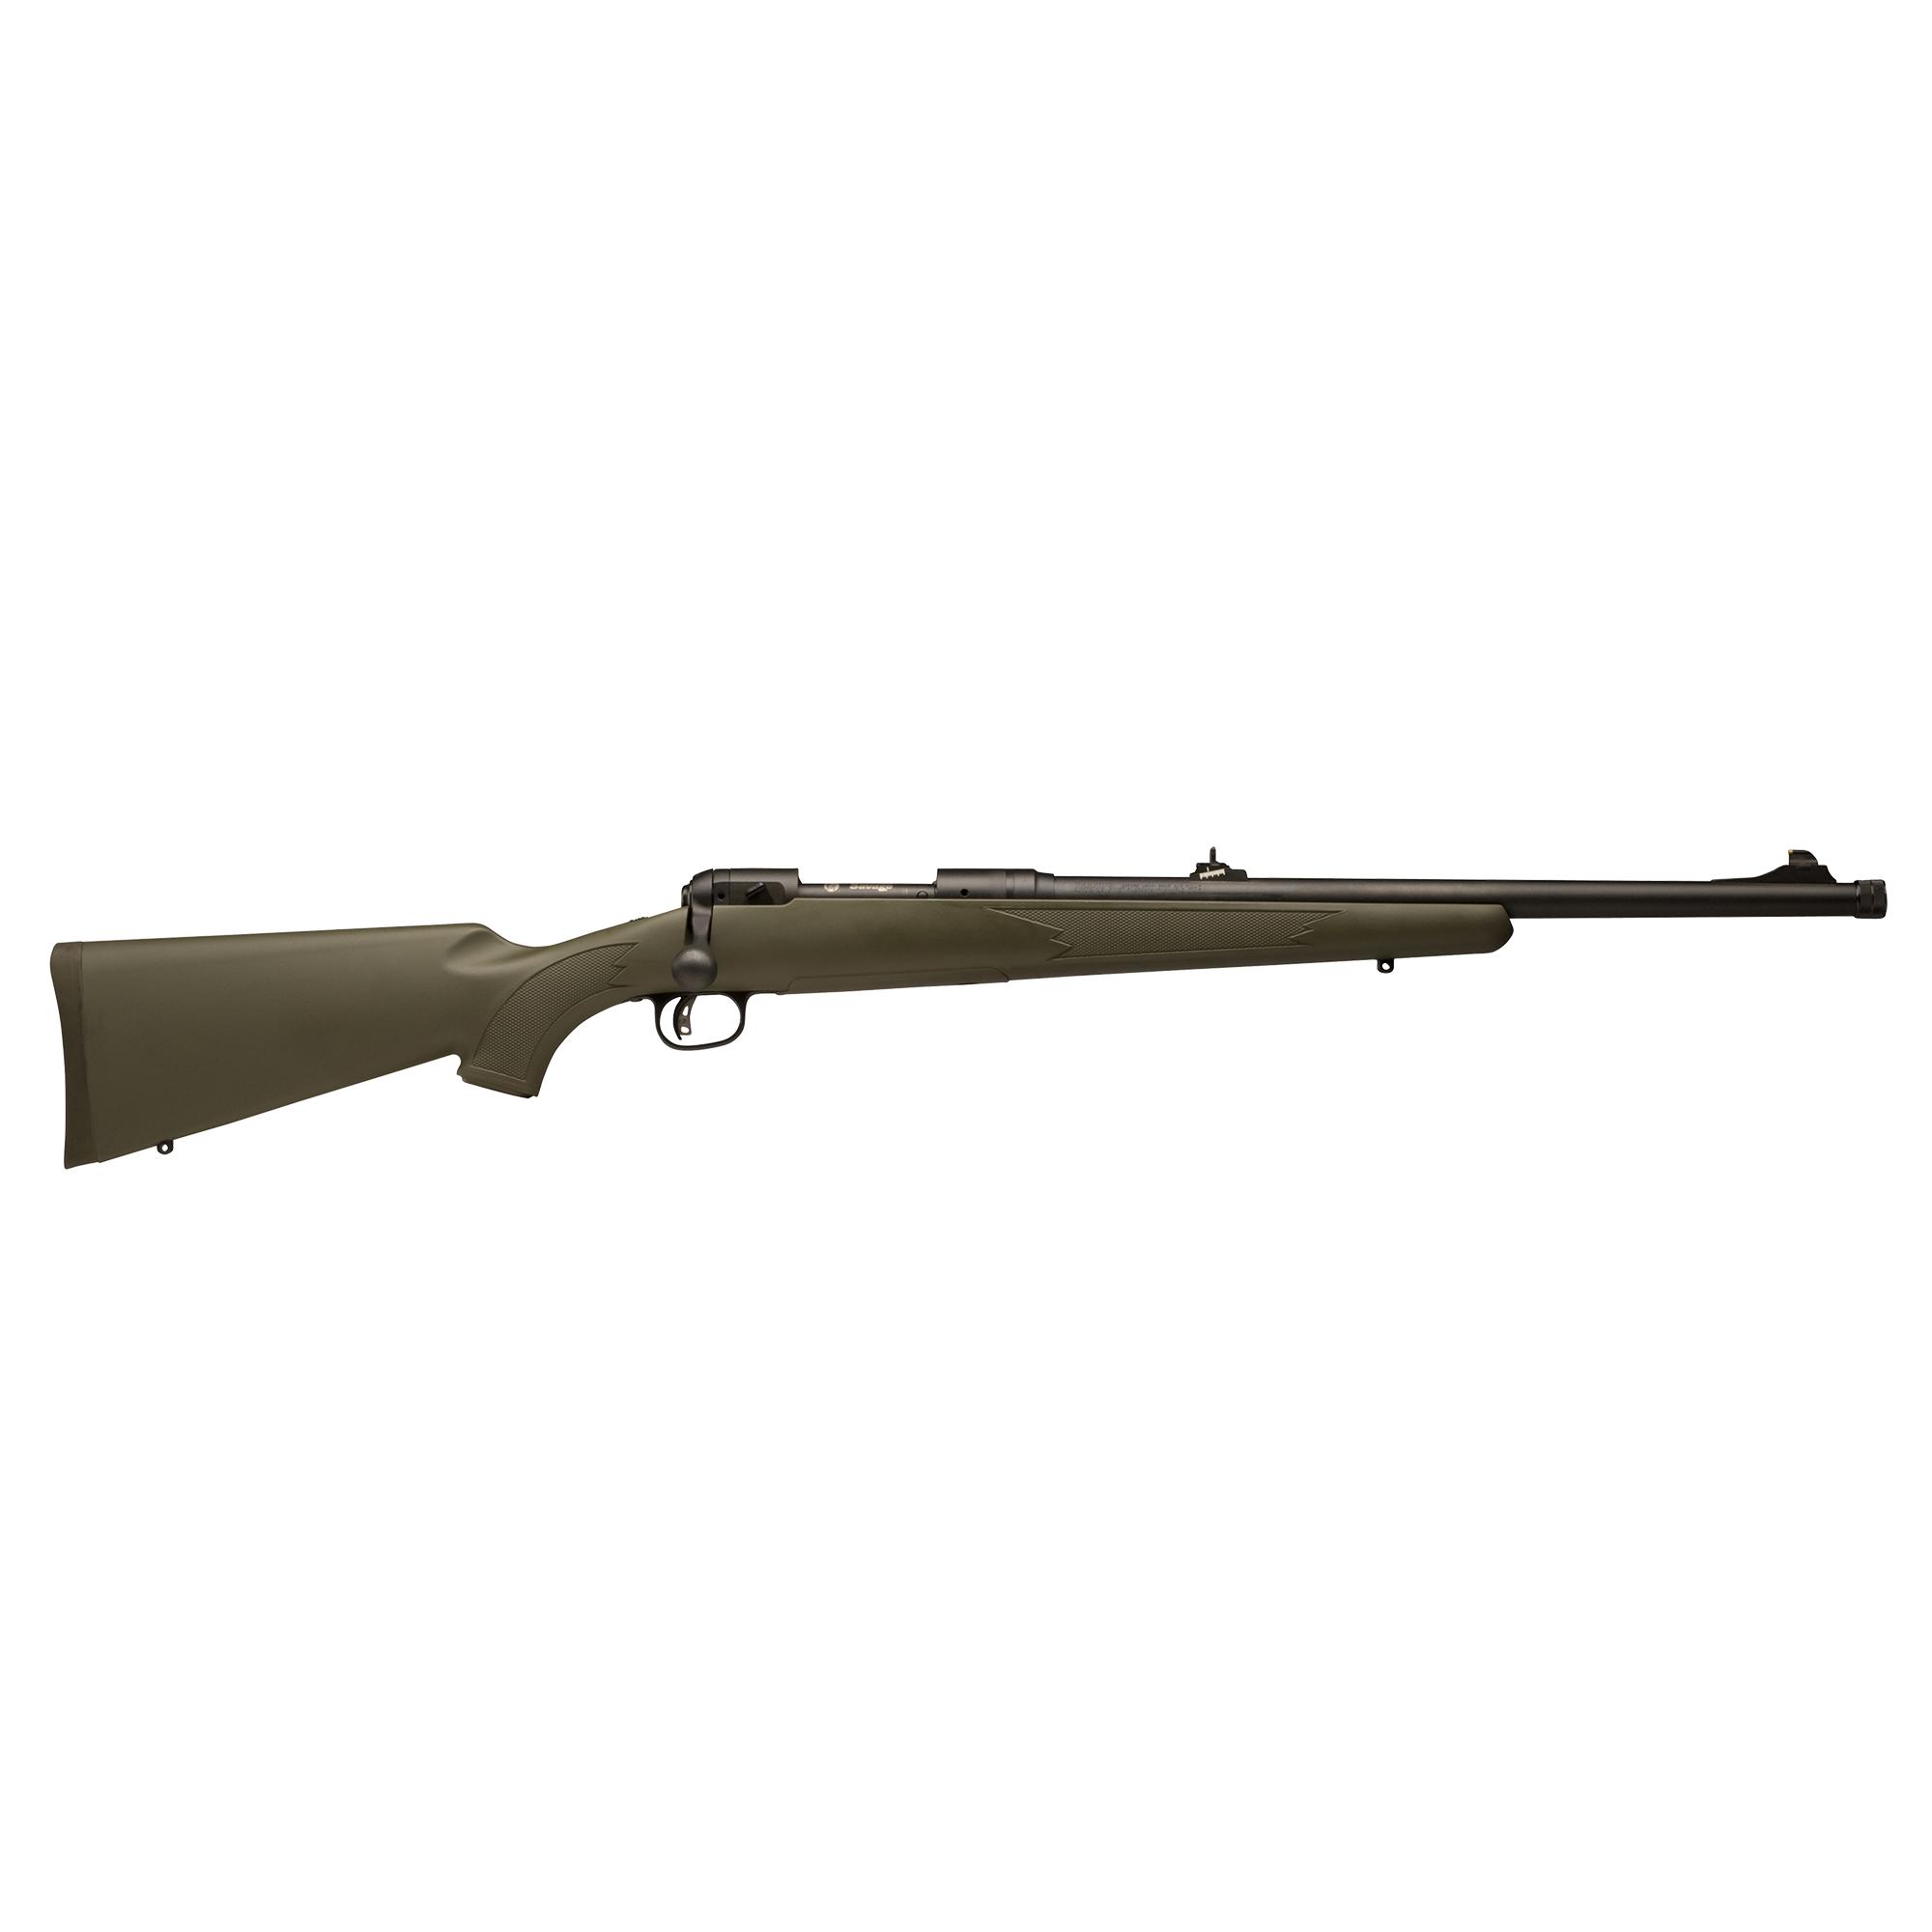 Savage Model 11 Hog Hunter Centerfire Rifle, .308 Win.